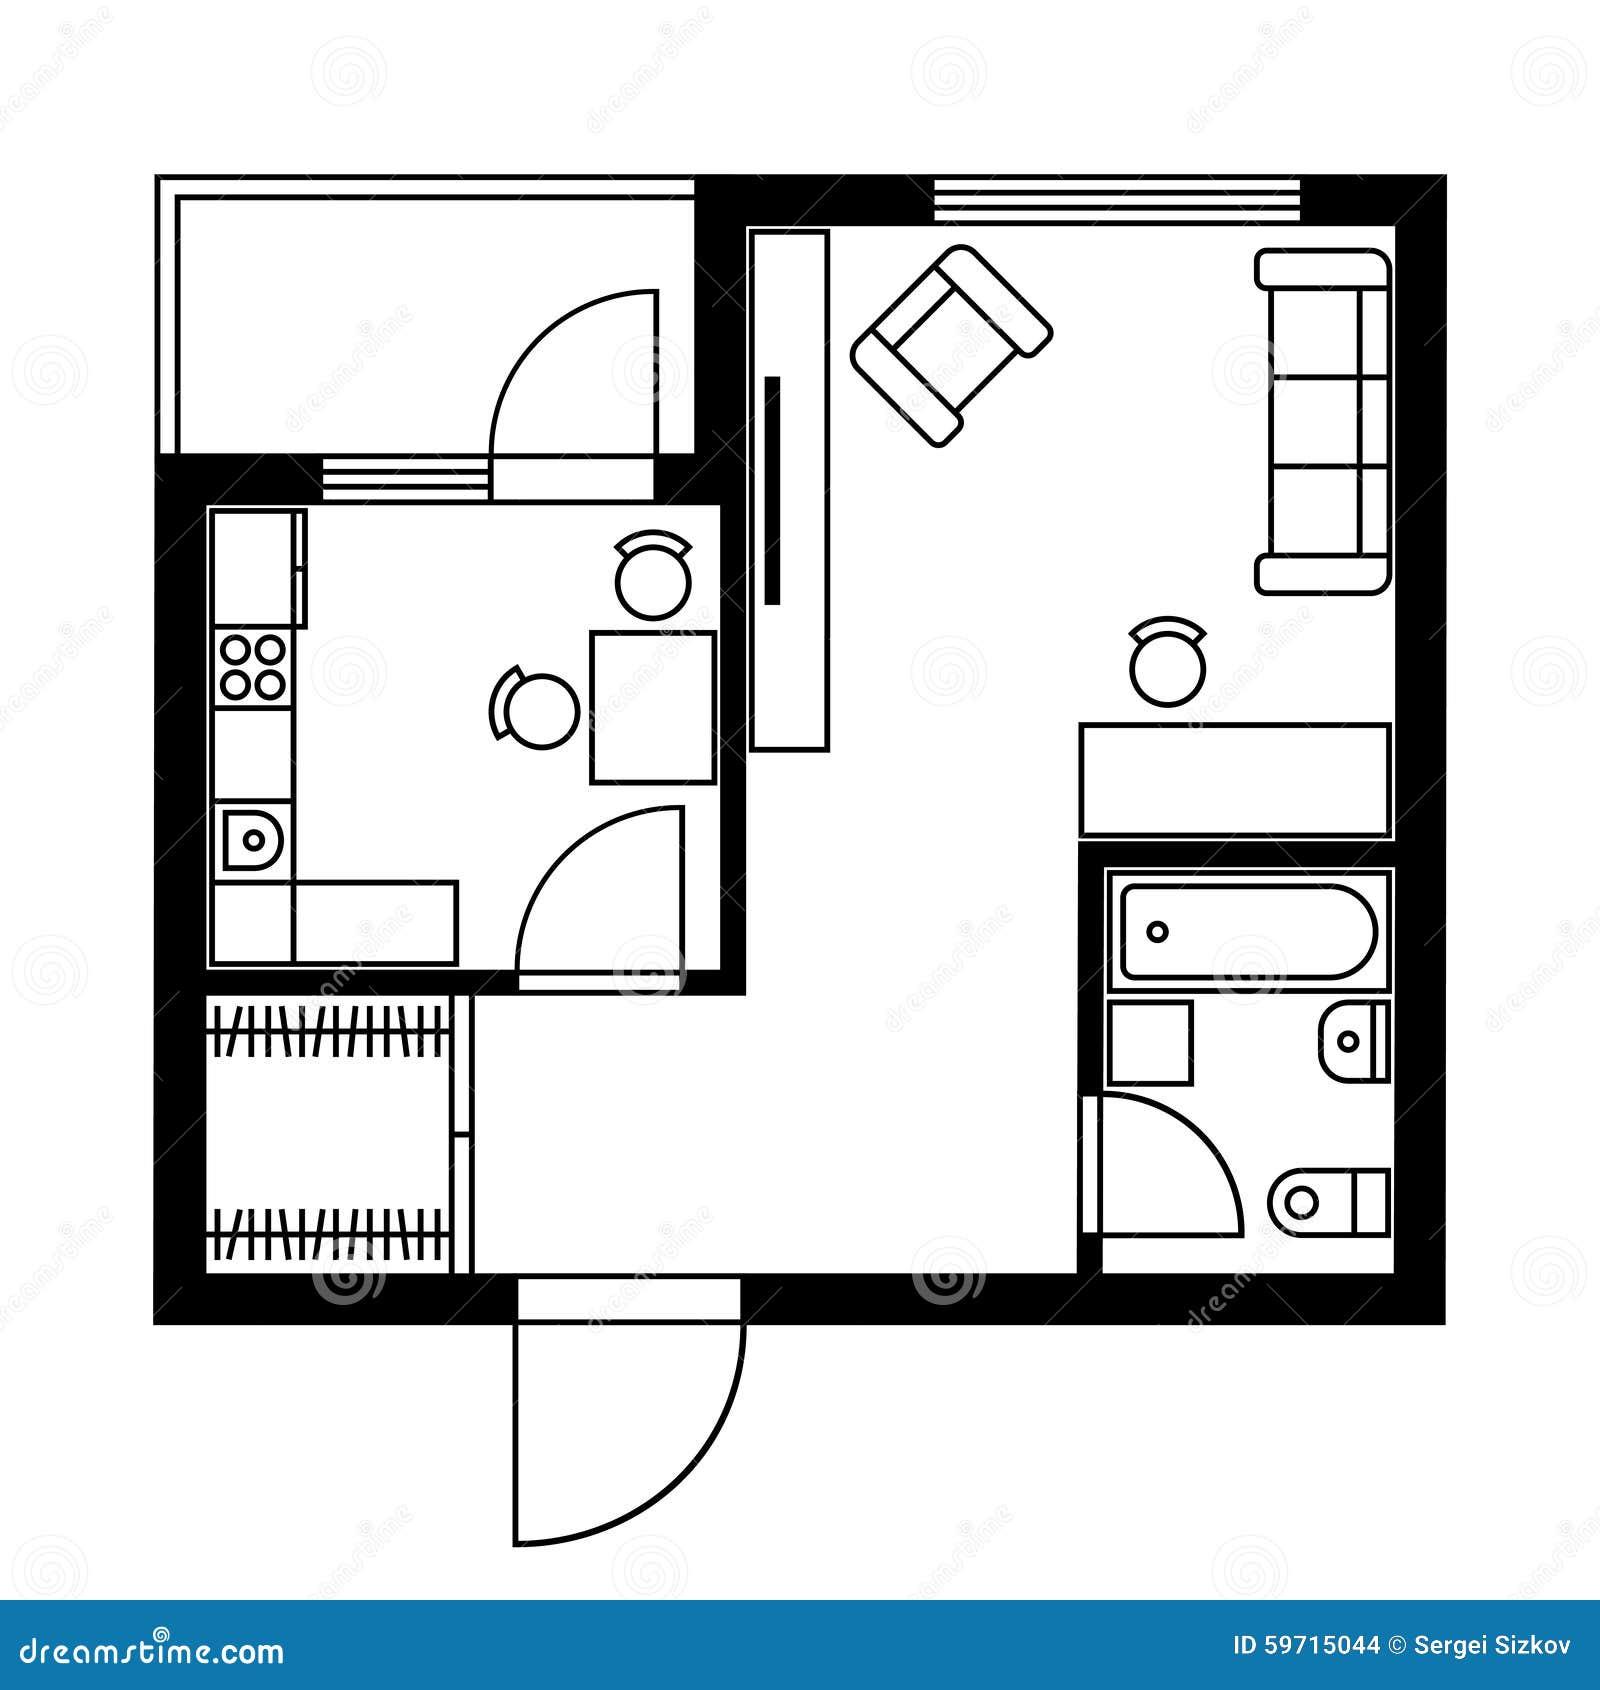 D illustration meubles plan